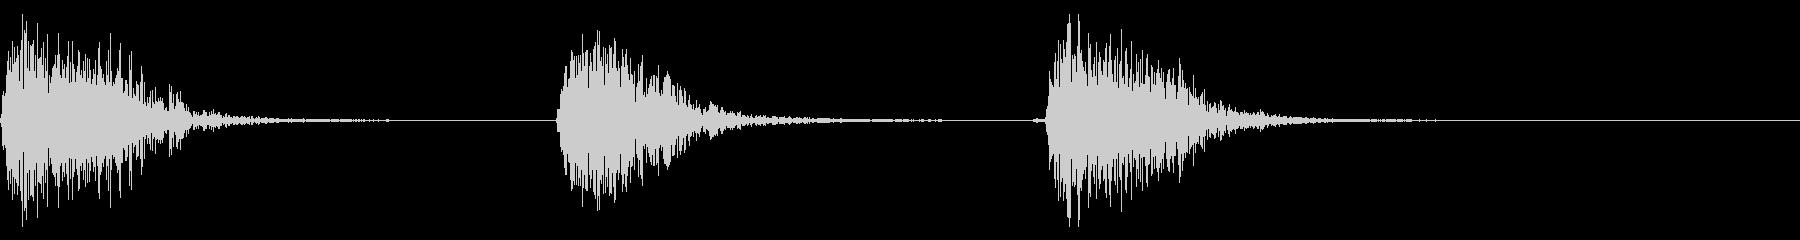 Bright fill-in nylon guitar's unreproduced waveform